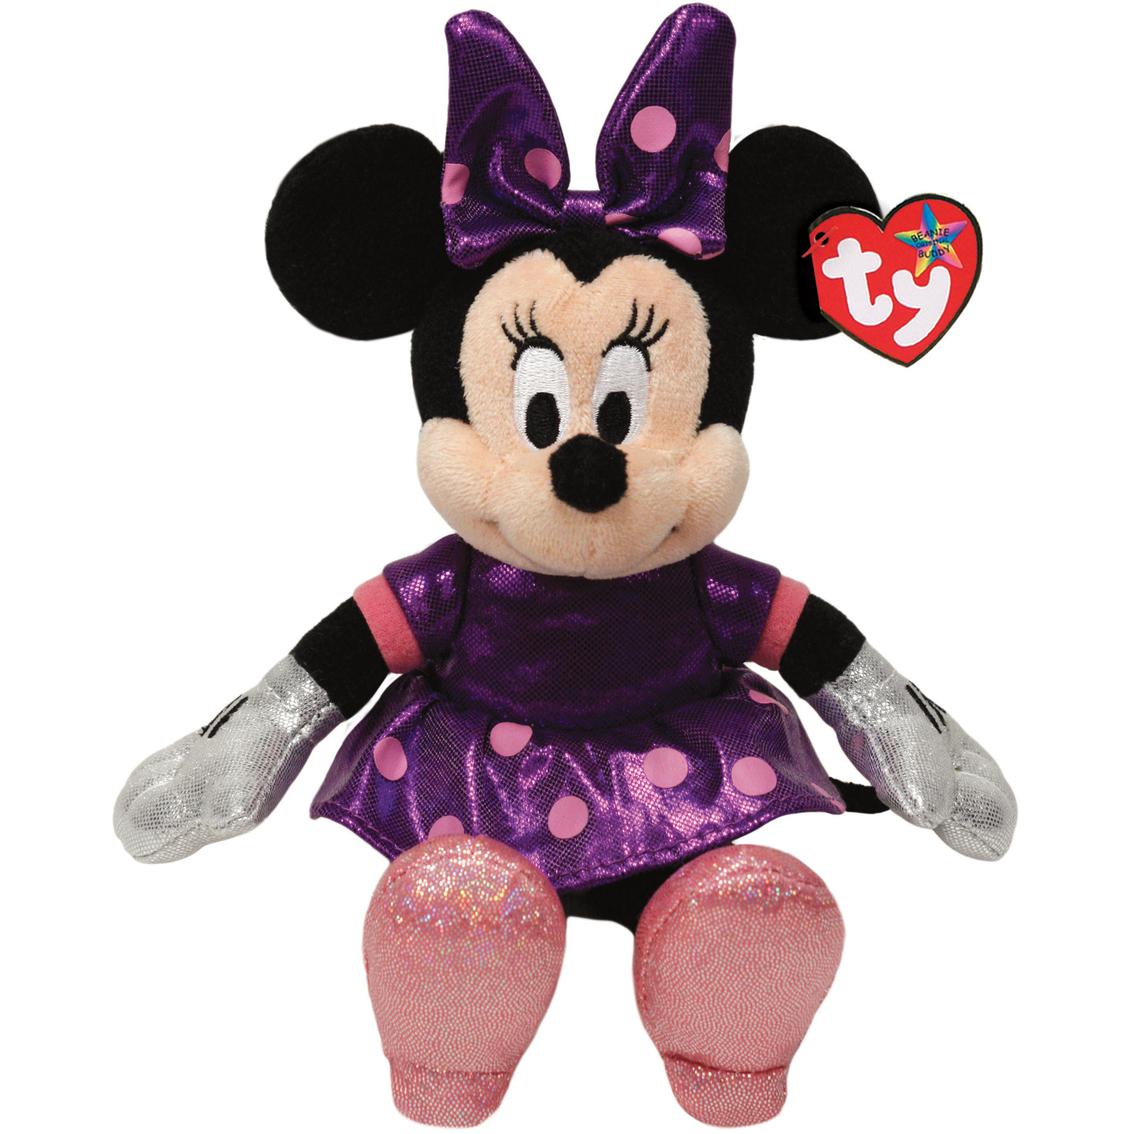 Ty Disney Minnie Mouse Plush Toy Stuffed Animals Baby